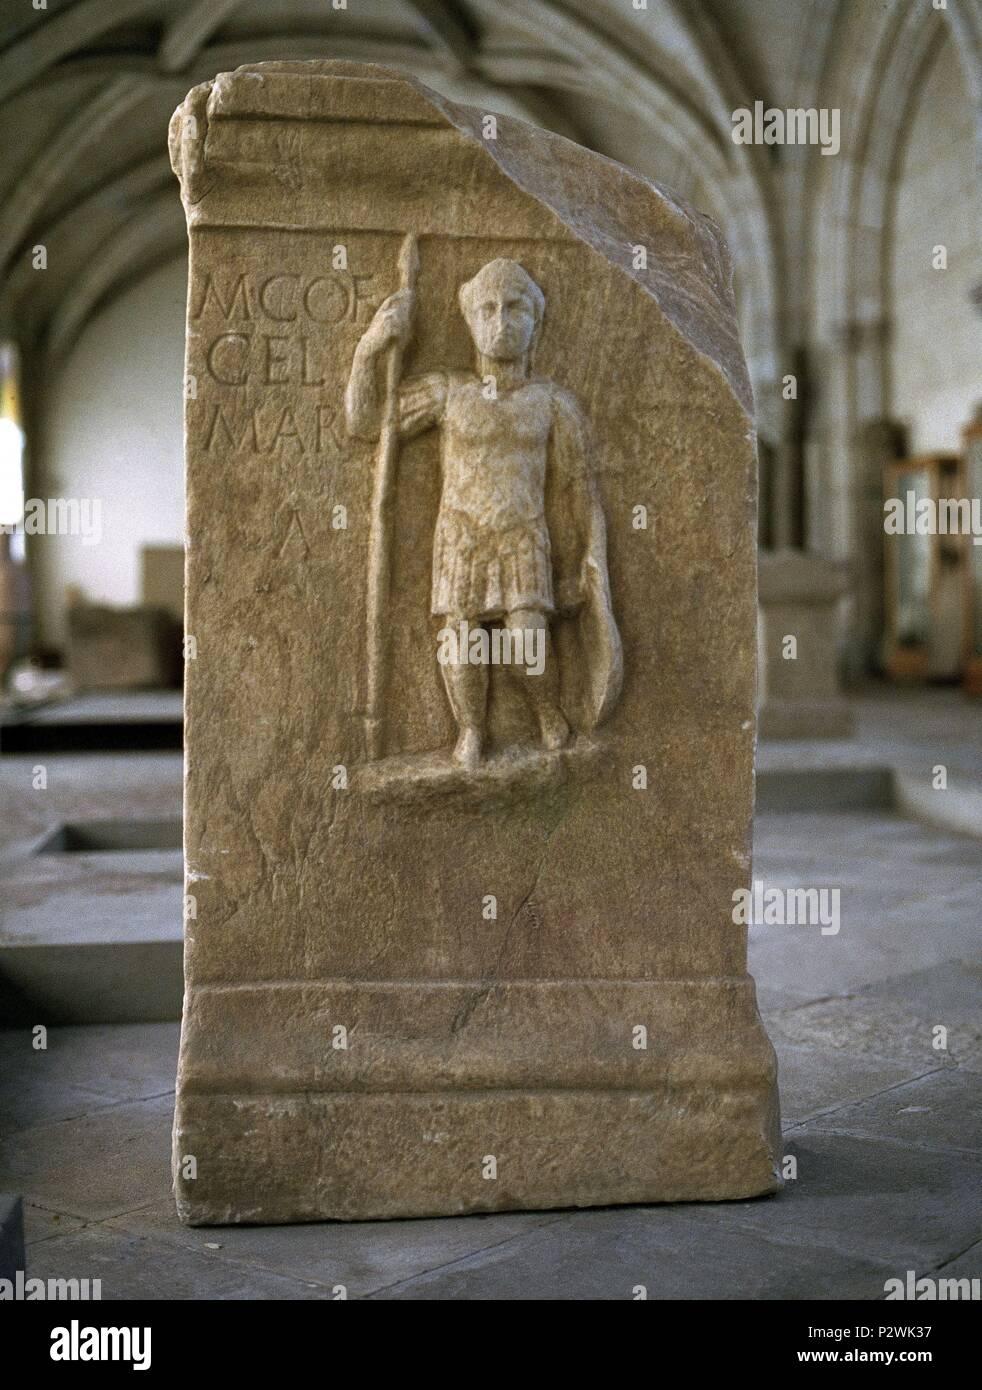 GUERRERO LUSITANO - ARTE ROMANO. Location: ARCHAEOLOGICAL MUSEUM, LISBOA, PORTUGAL. - Stock Image